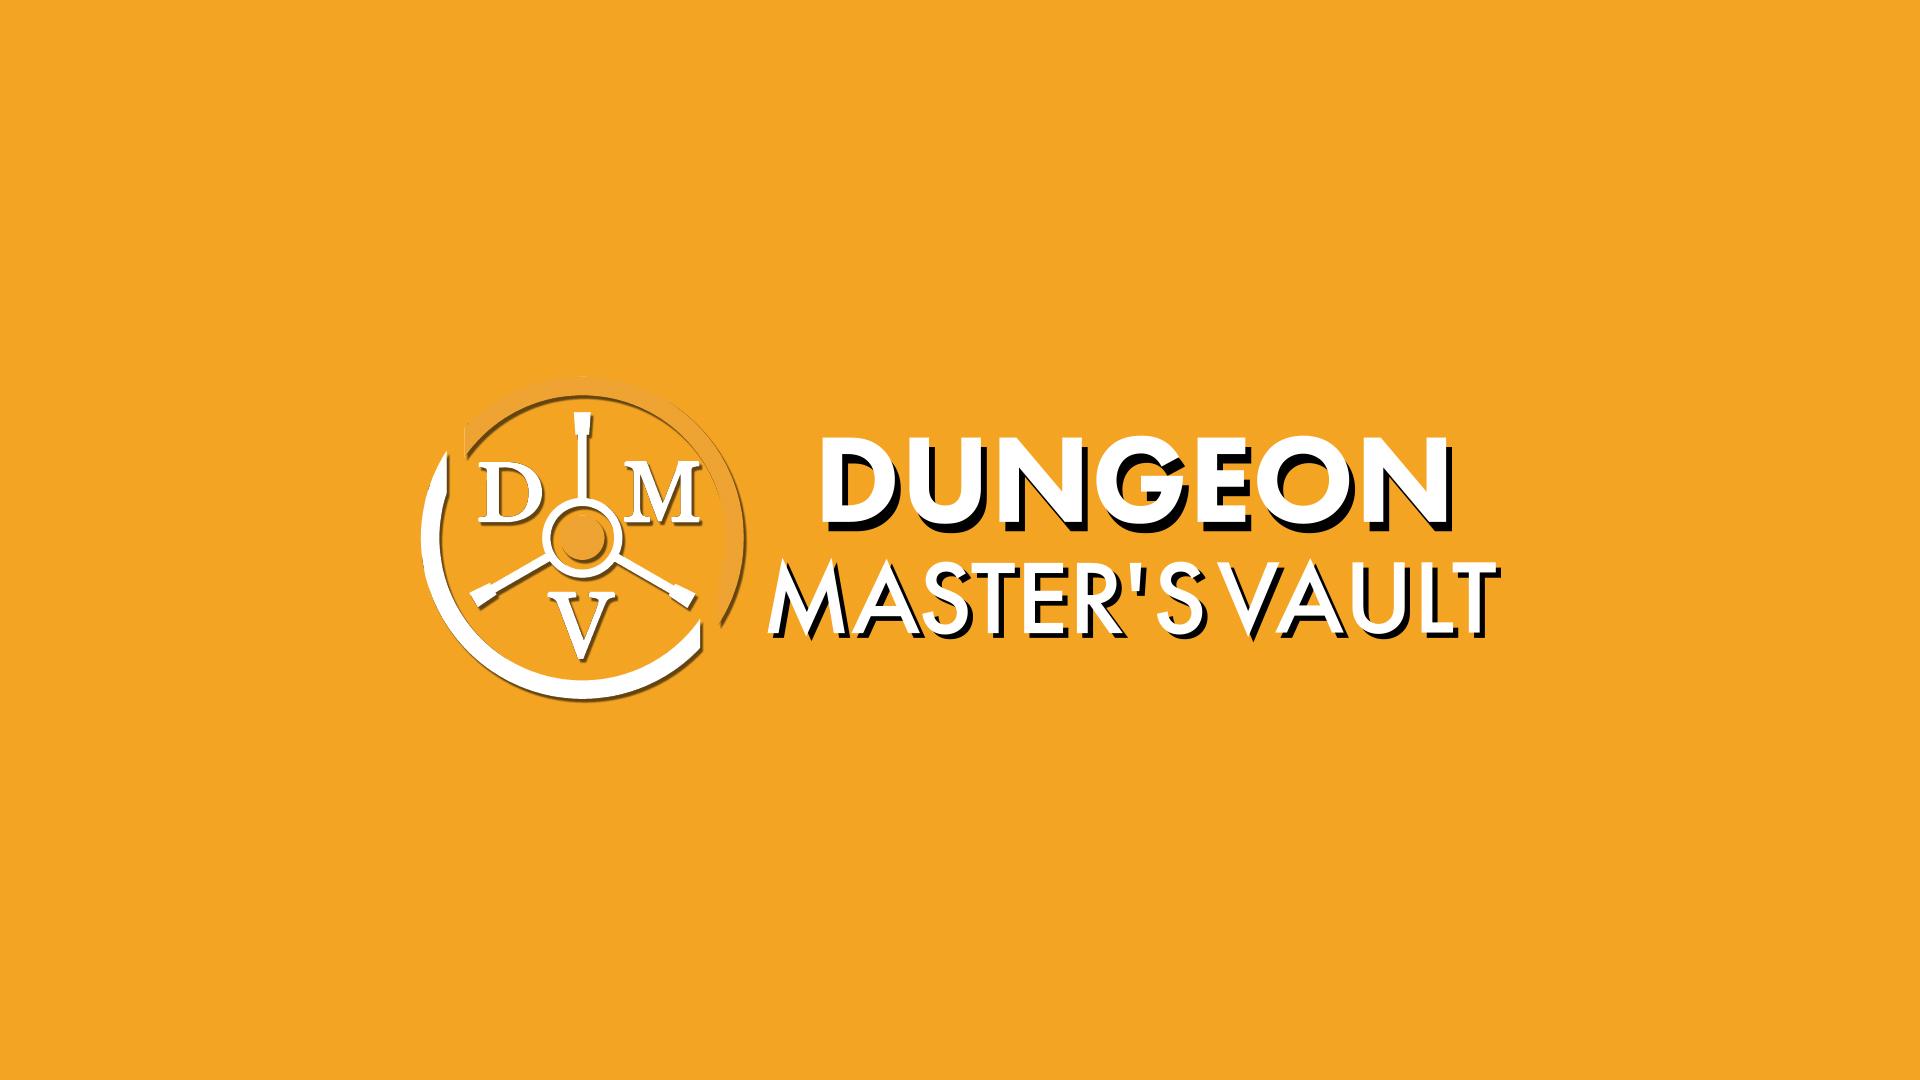 Dungeon-Masters-Vault-logo